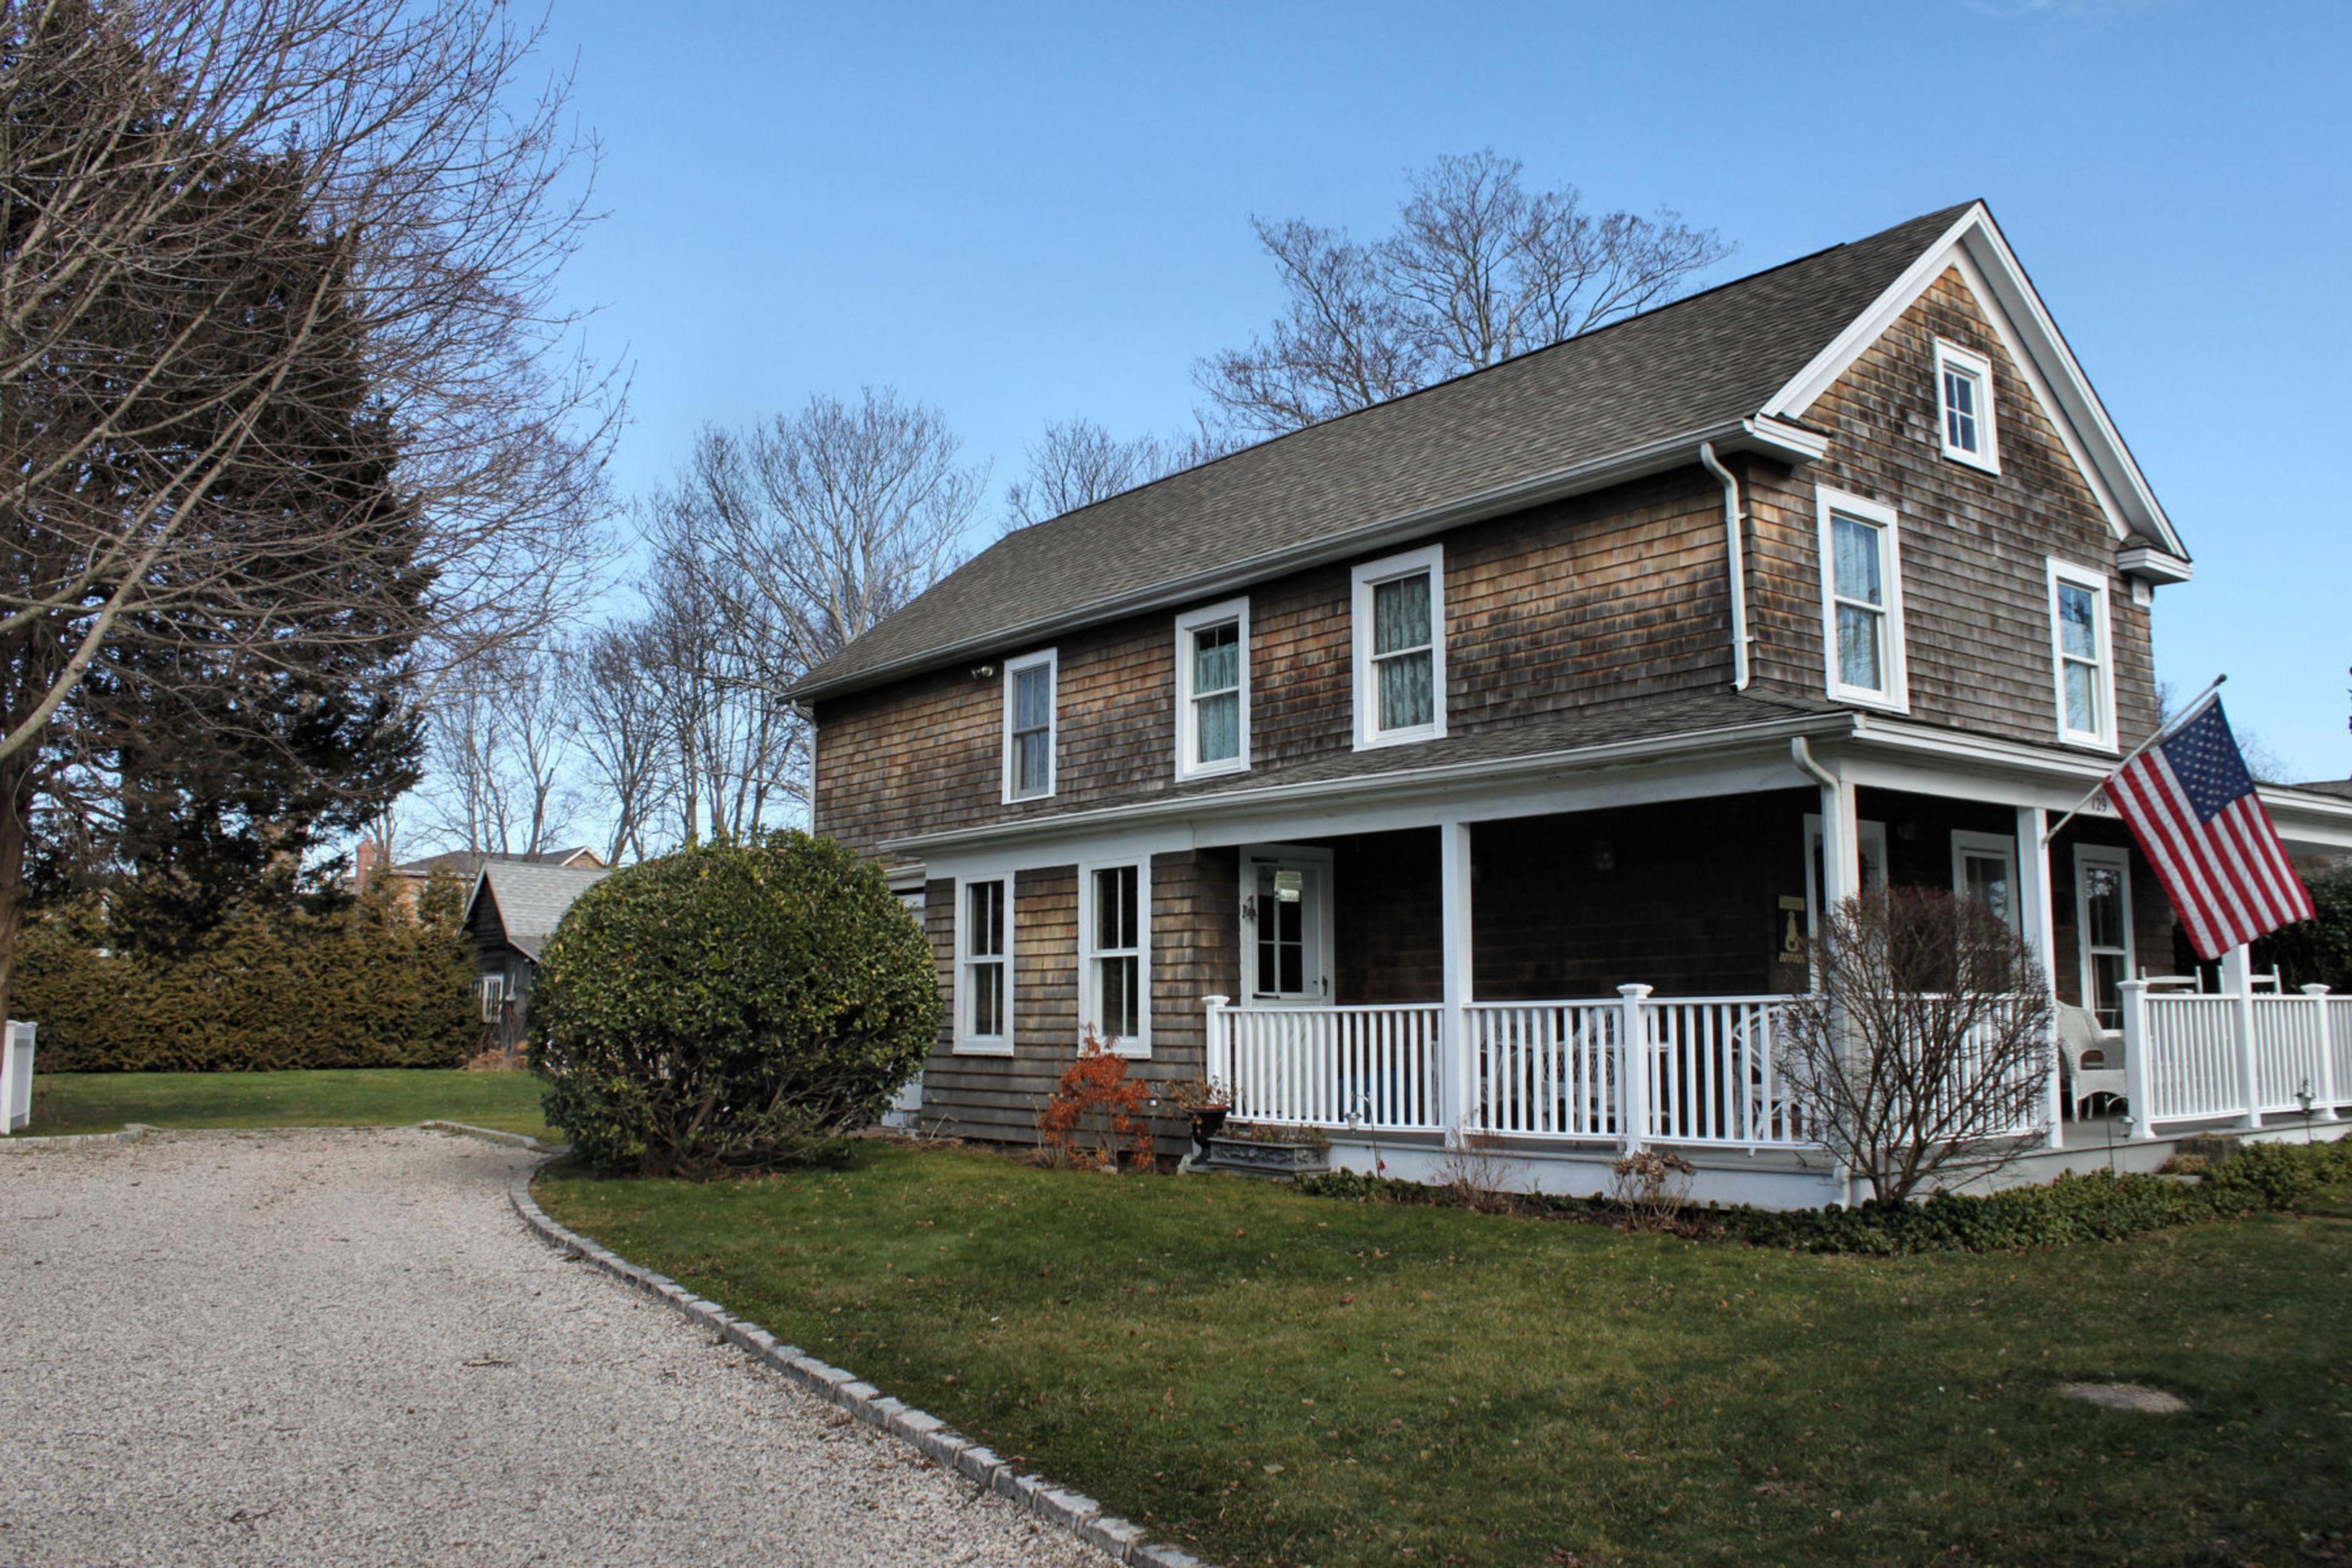 129 Willow St - Southampton Village, New York